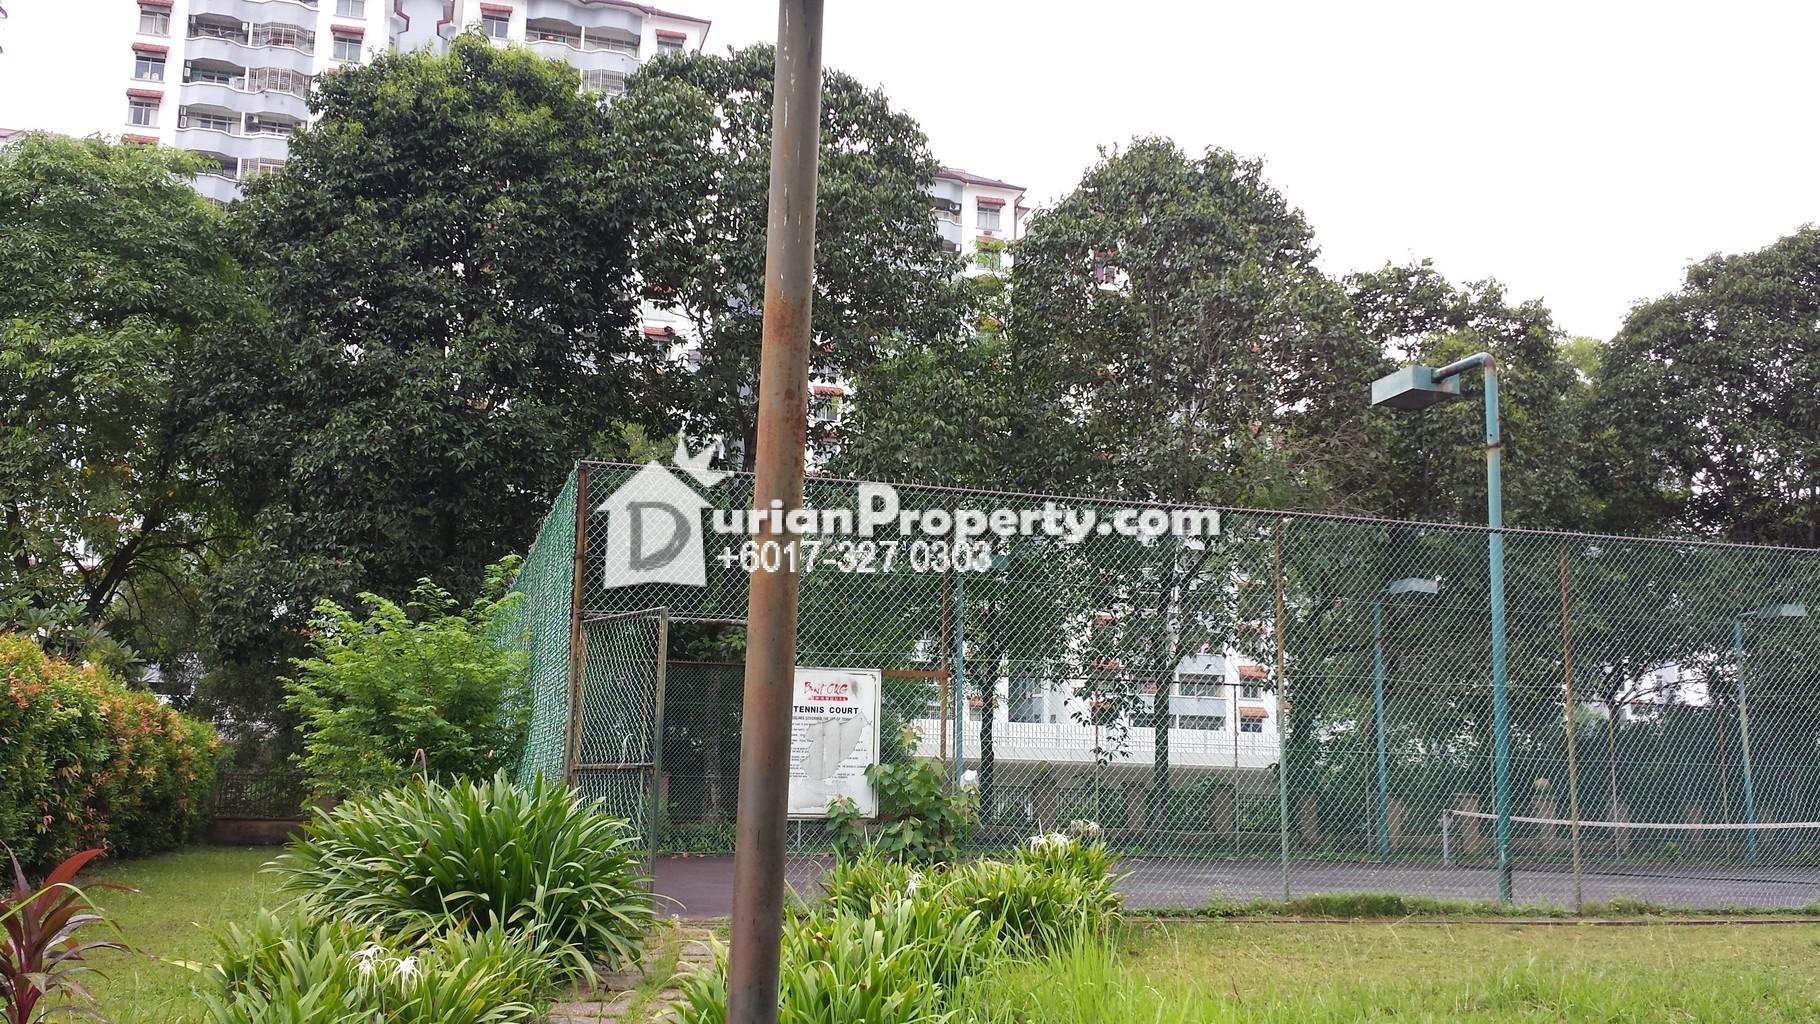 Townhouse For Sale at Bukit OUG Townhouse, Bukit Jalil